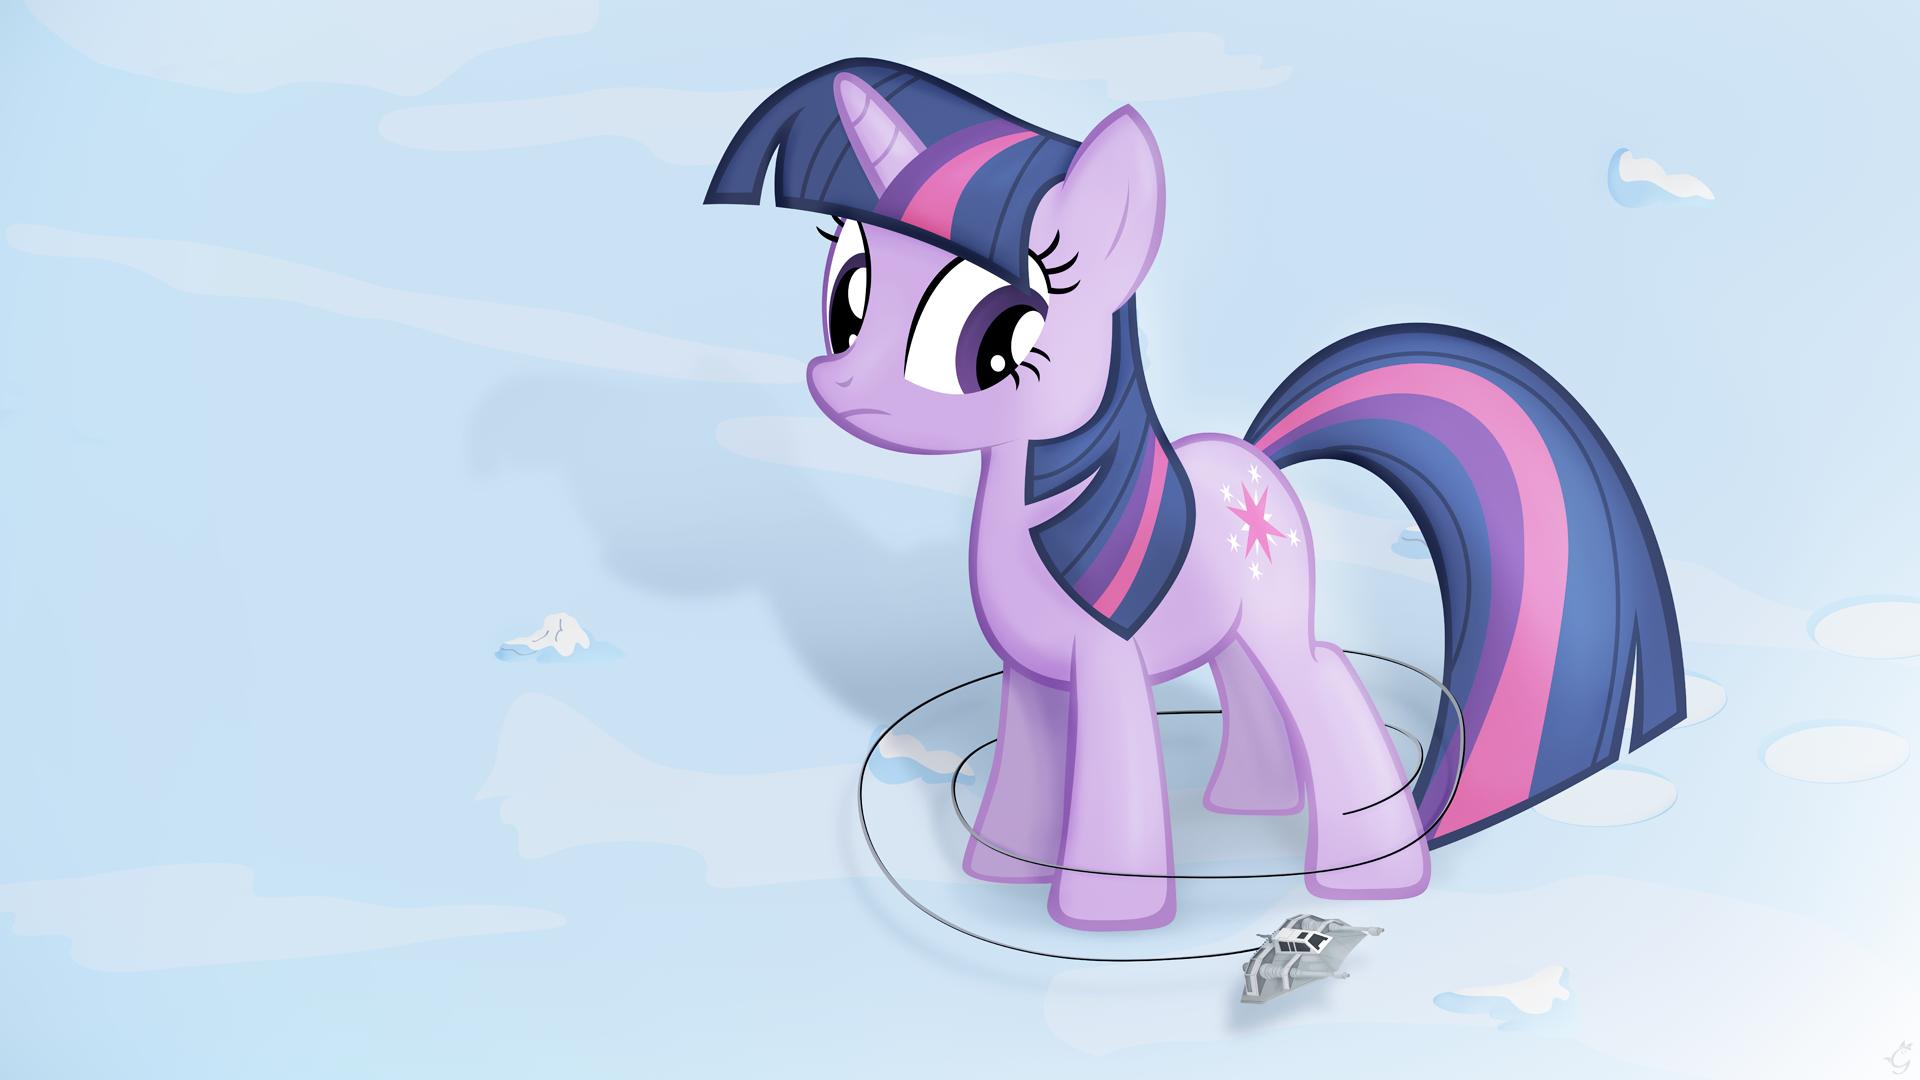 Bring that pony down - widescreen by Stinkehund